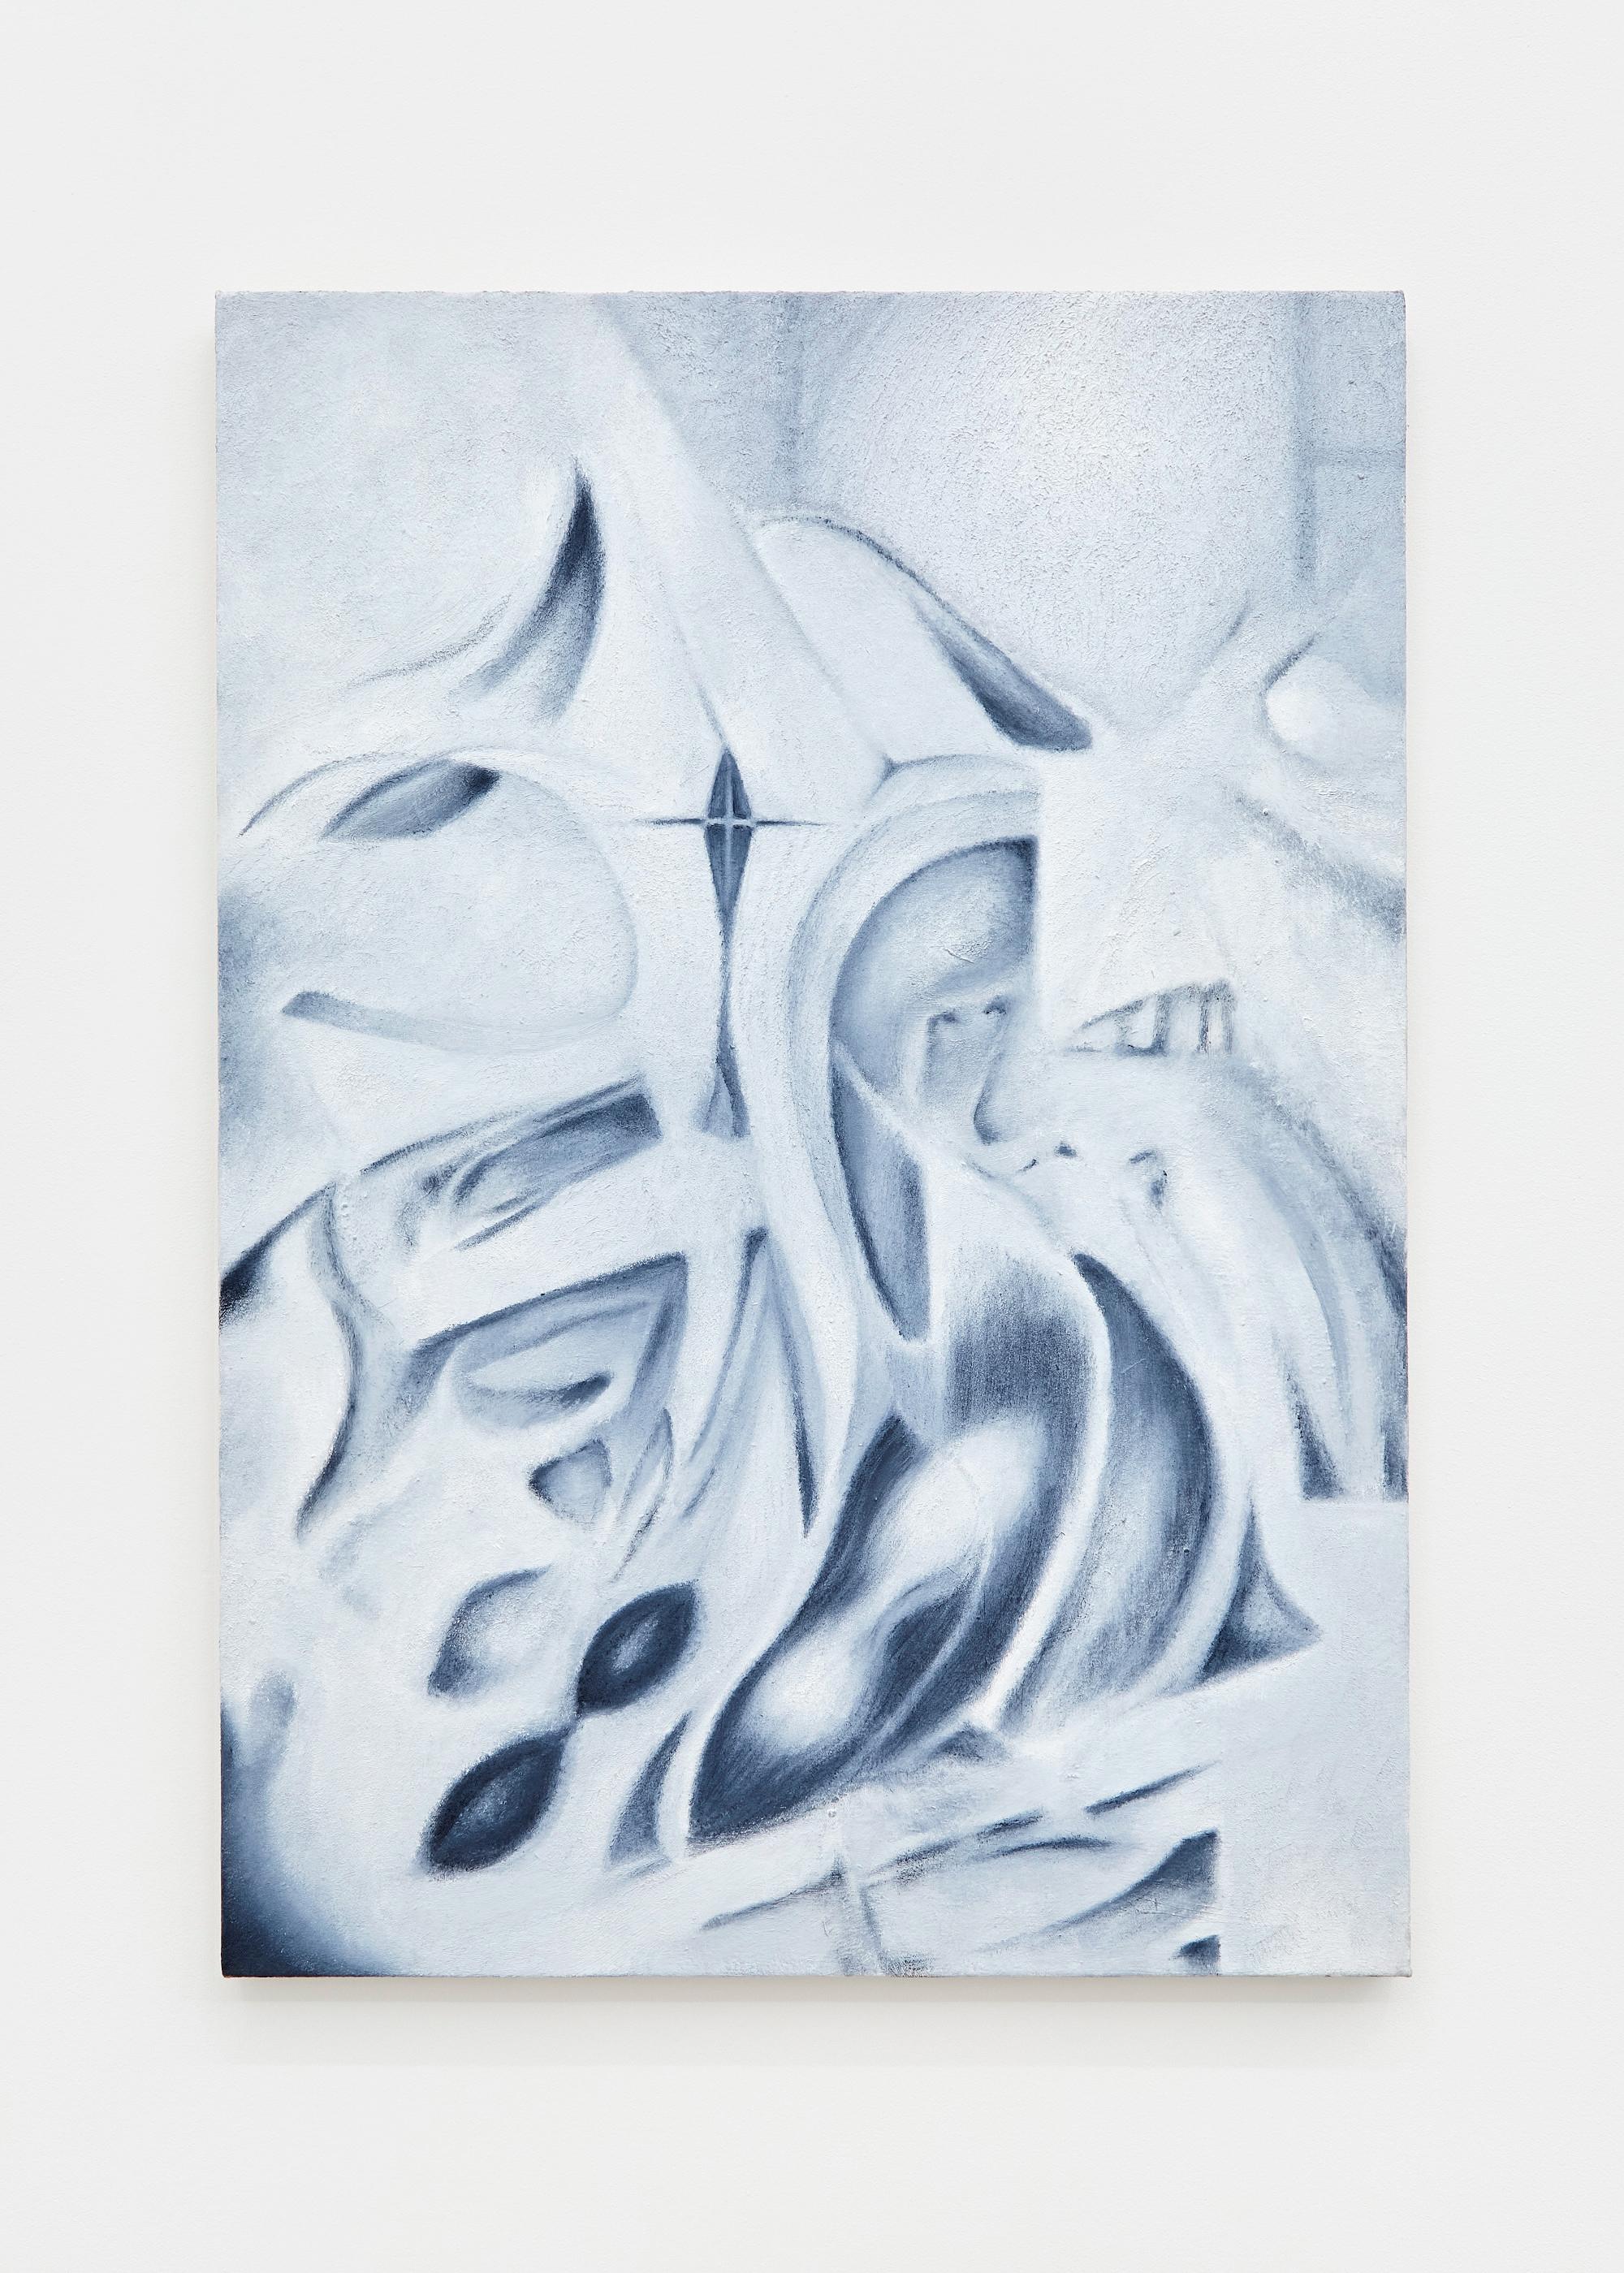 Kin-ting Li, 'Eidetic Maneki-neko', 2020. Oil on canvas, 87 x 61 cm. photo: Corey Bartle Sanderson